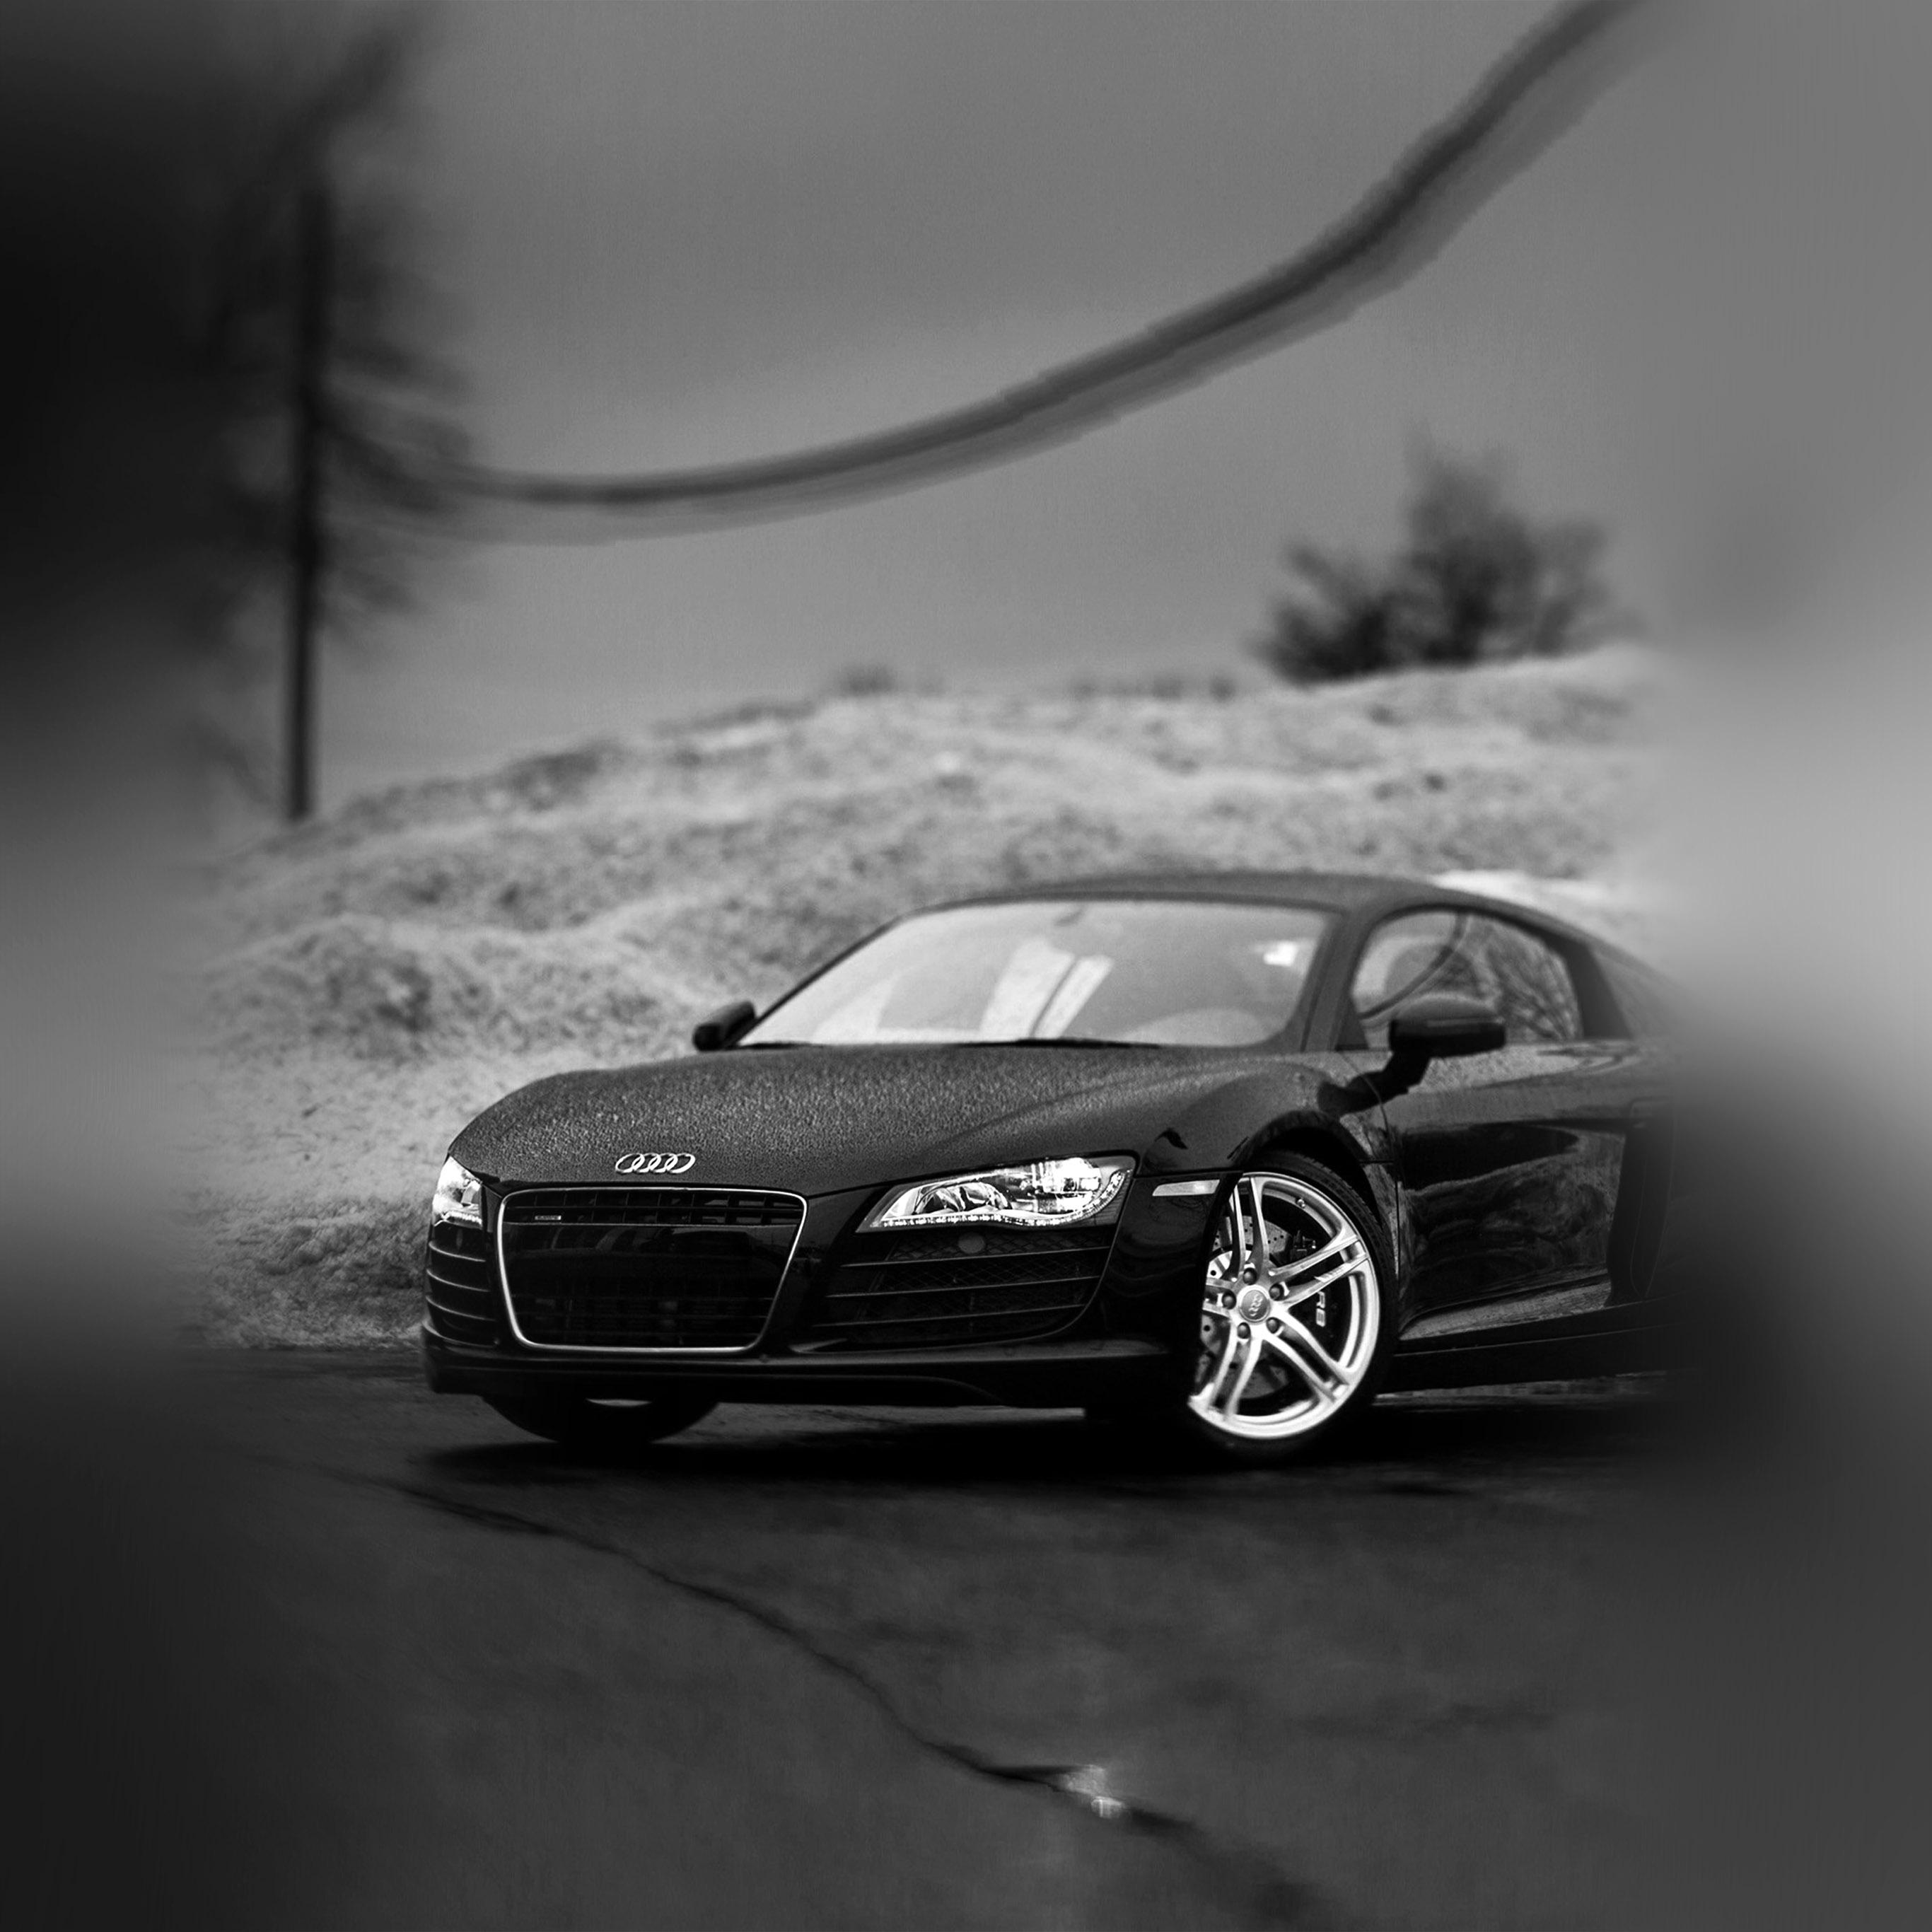 Audi Car Wallpaper: Ax28-audi-car-rain-illustration-art-bw-dark